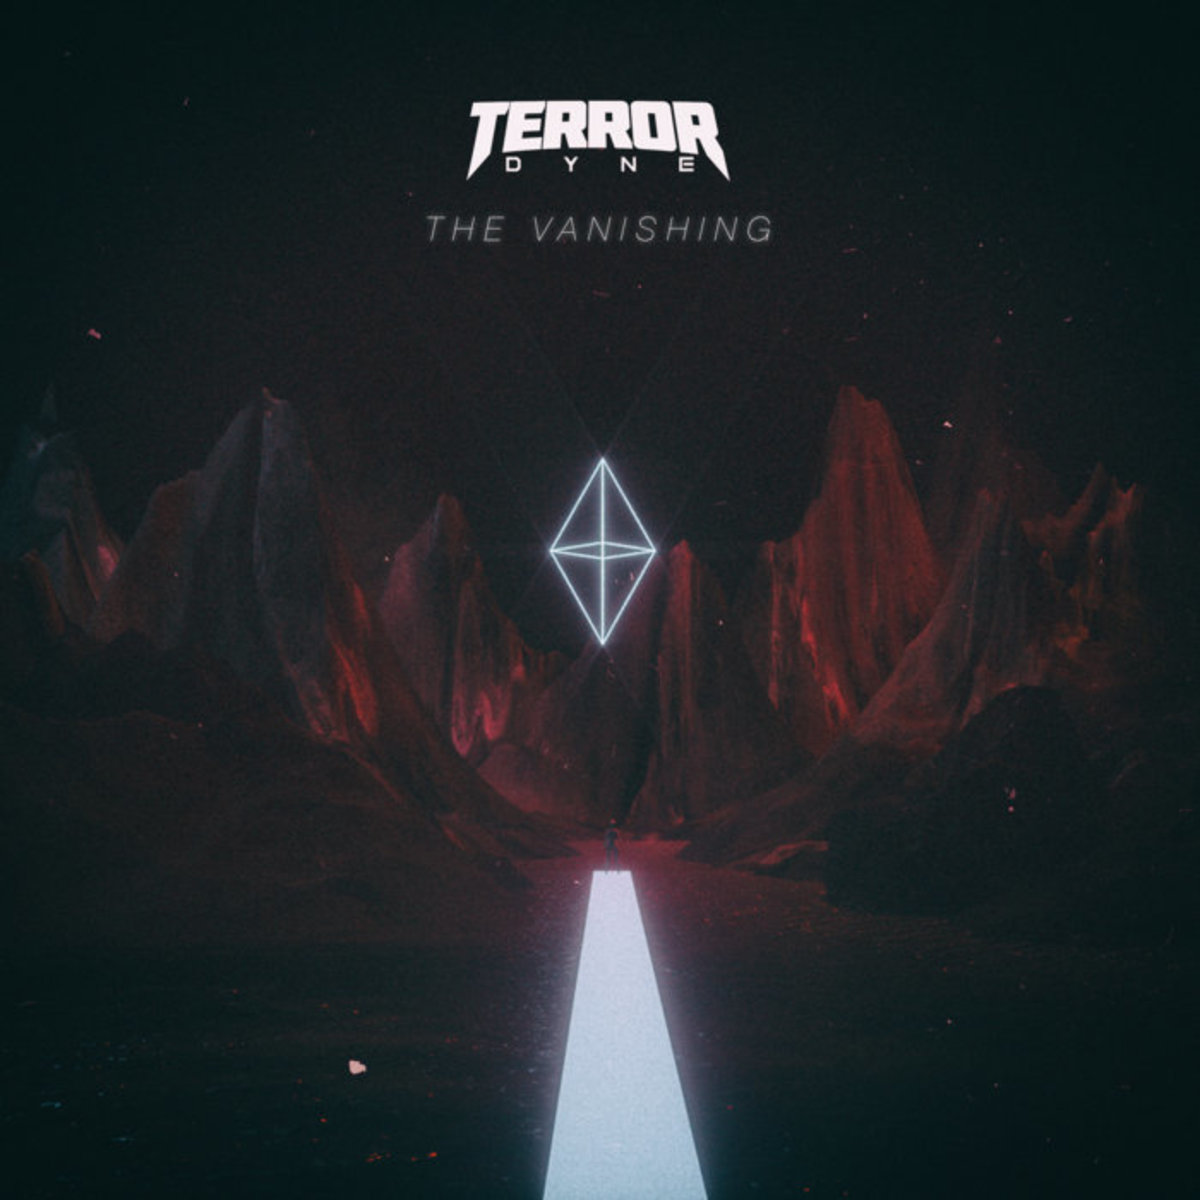 darksynth-album-review-the-vanishing-by-terrordyne